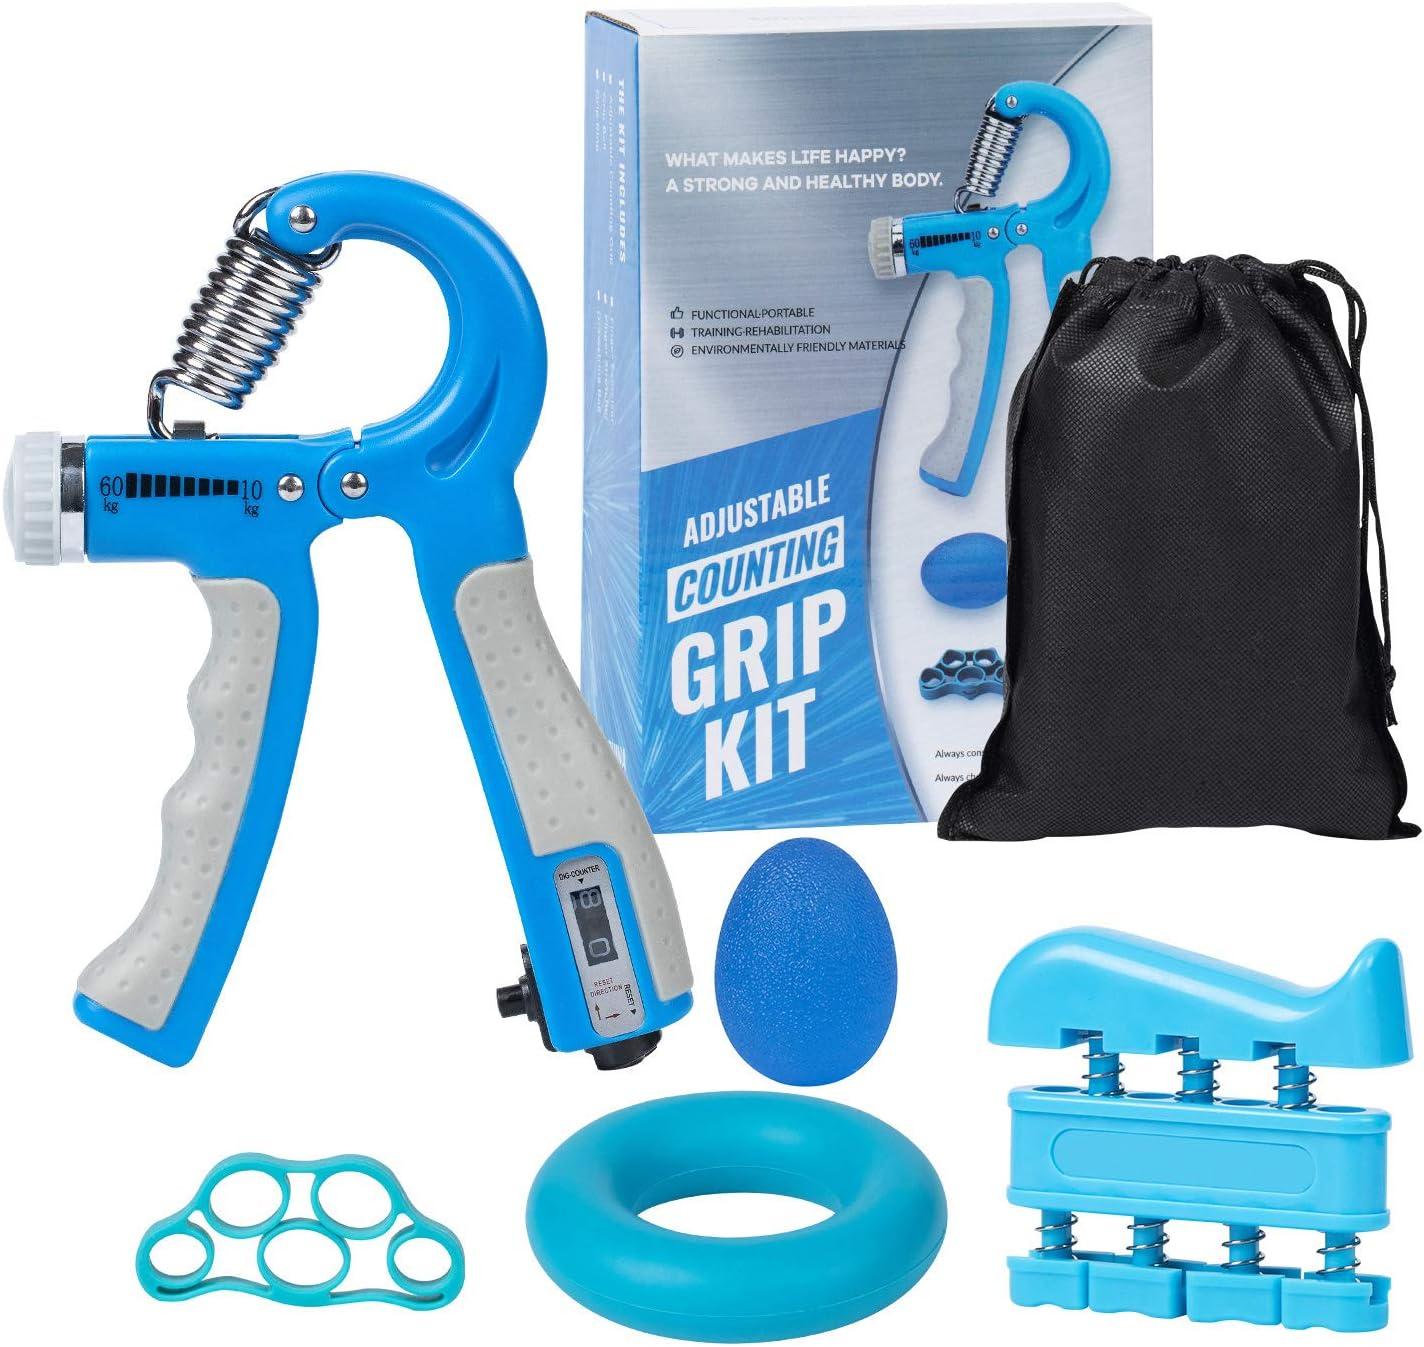 DomKom Grip Strength Trainer Workout Adjustable Max 82% OFF Re Kit 5 Pack online shop